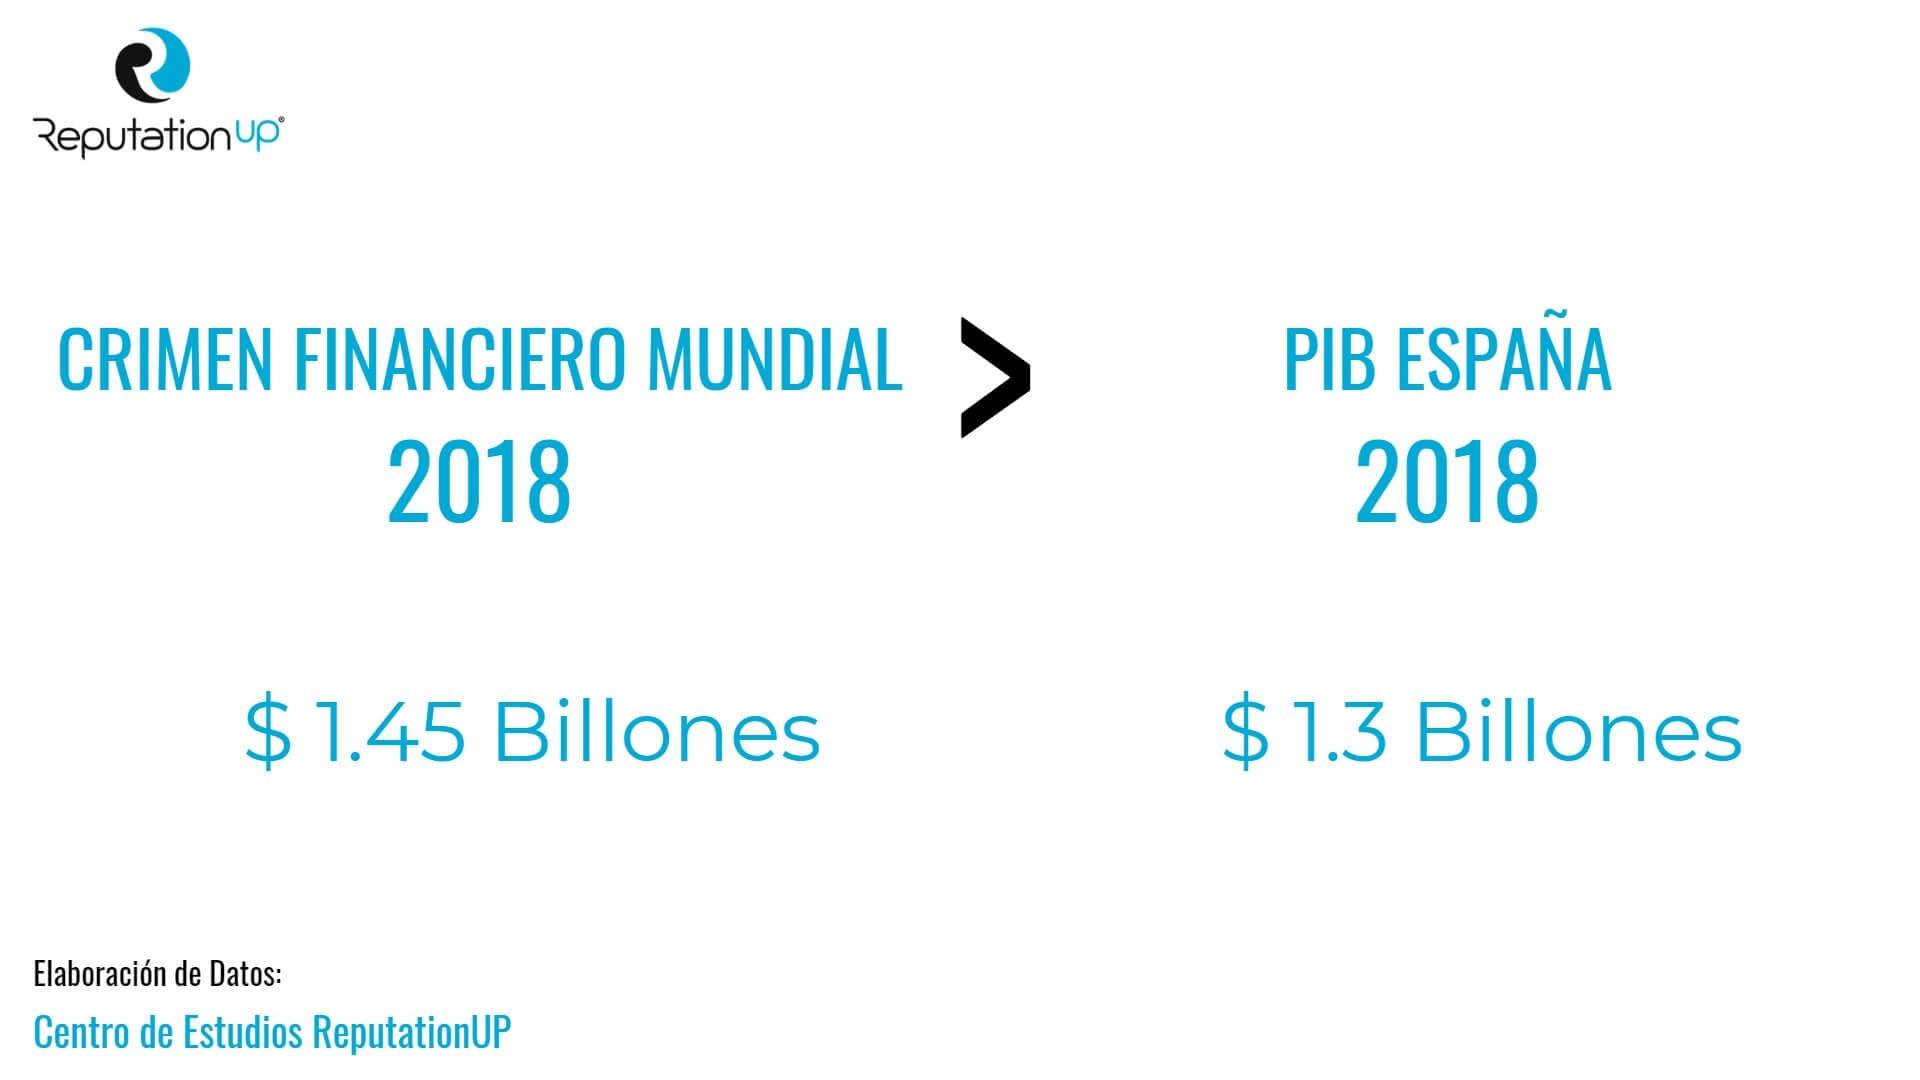 crimen financiero mundial maior de pib espana centro estudios reputationup world check